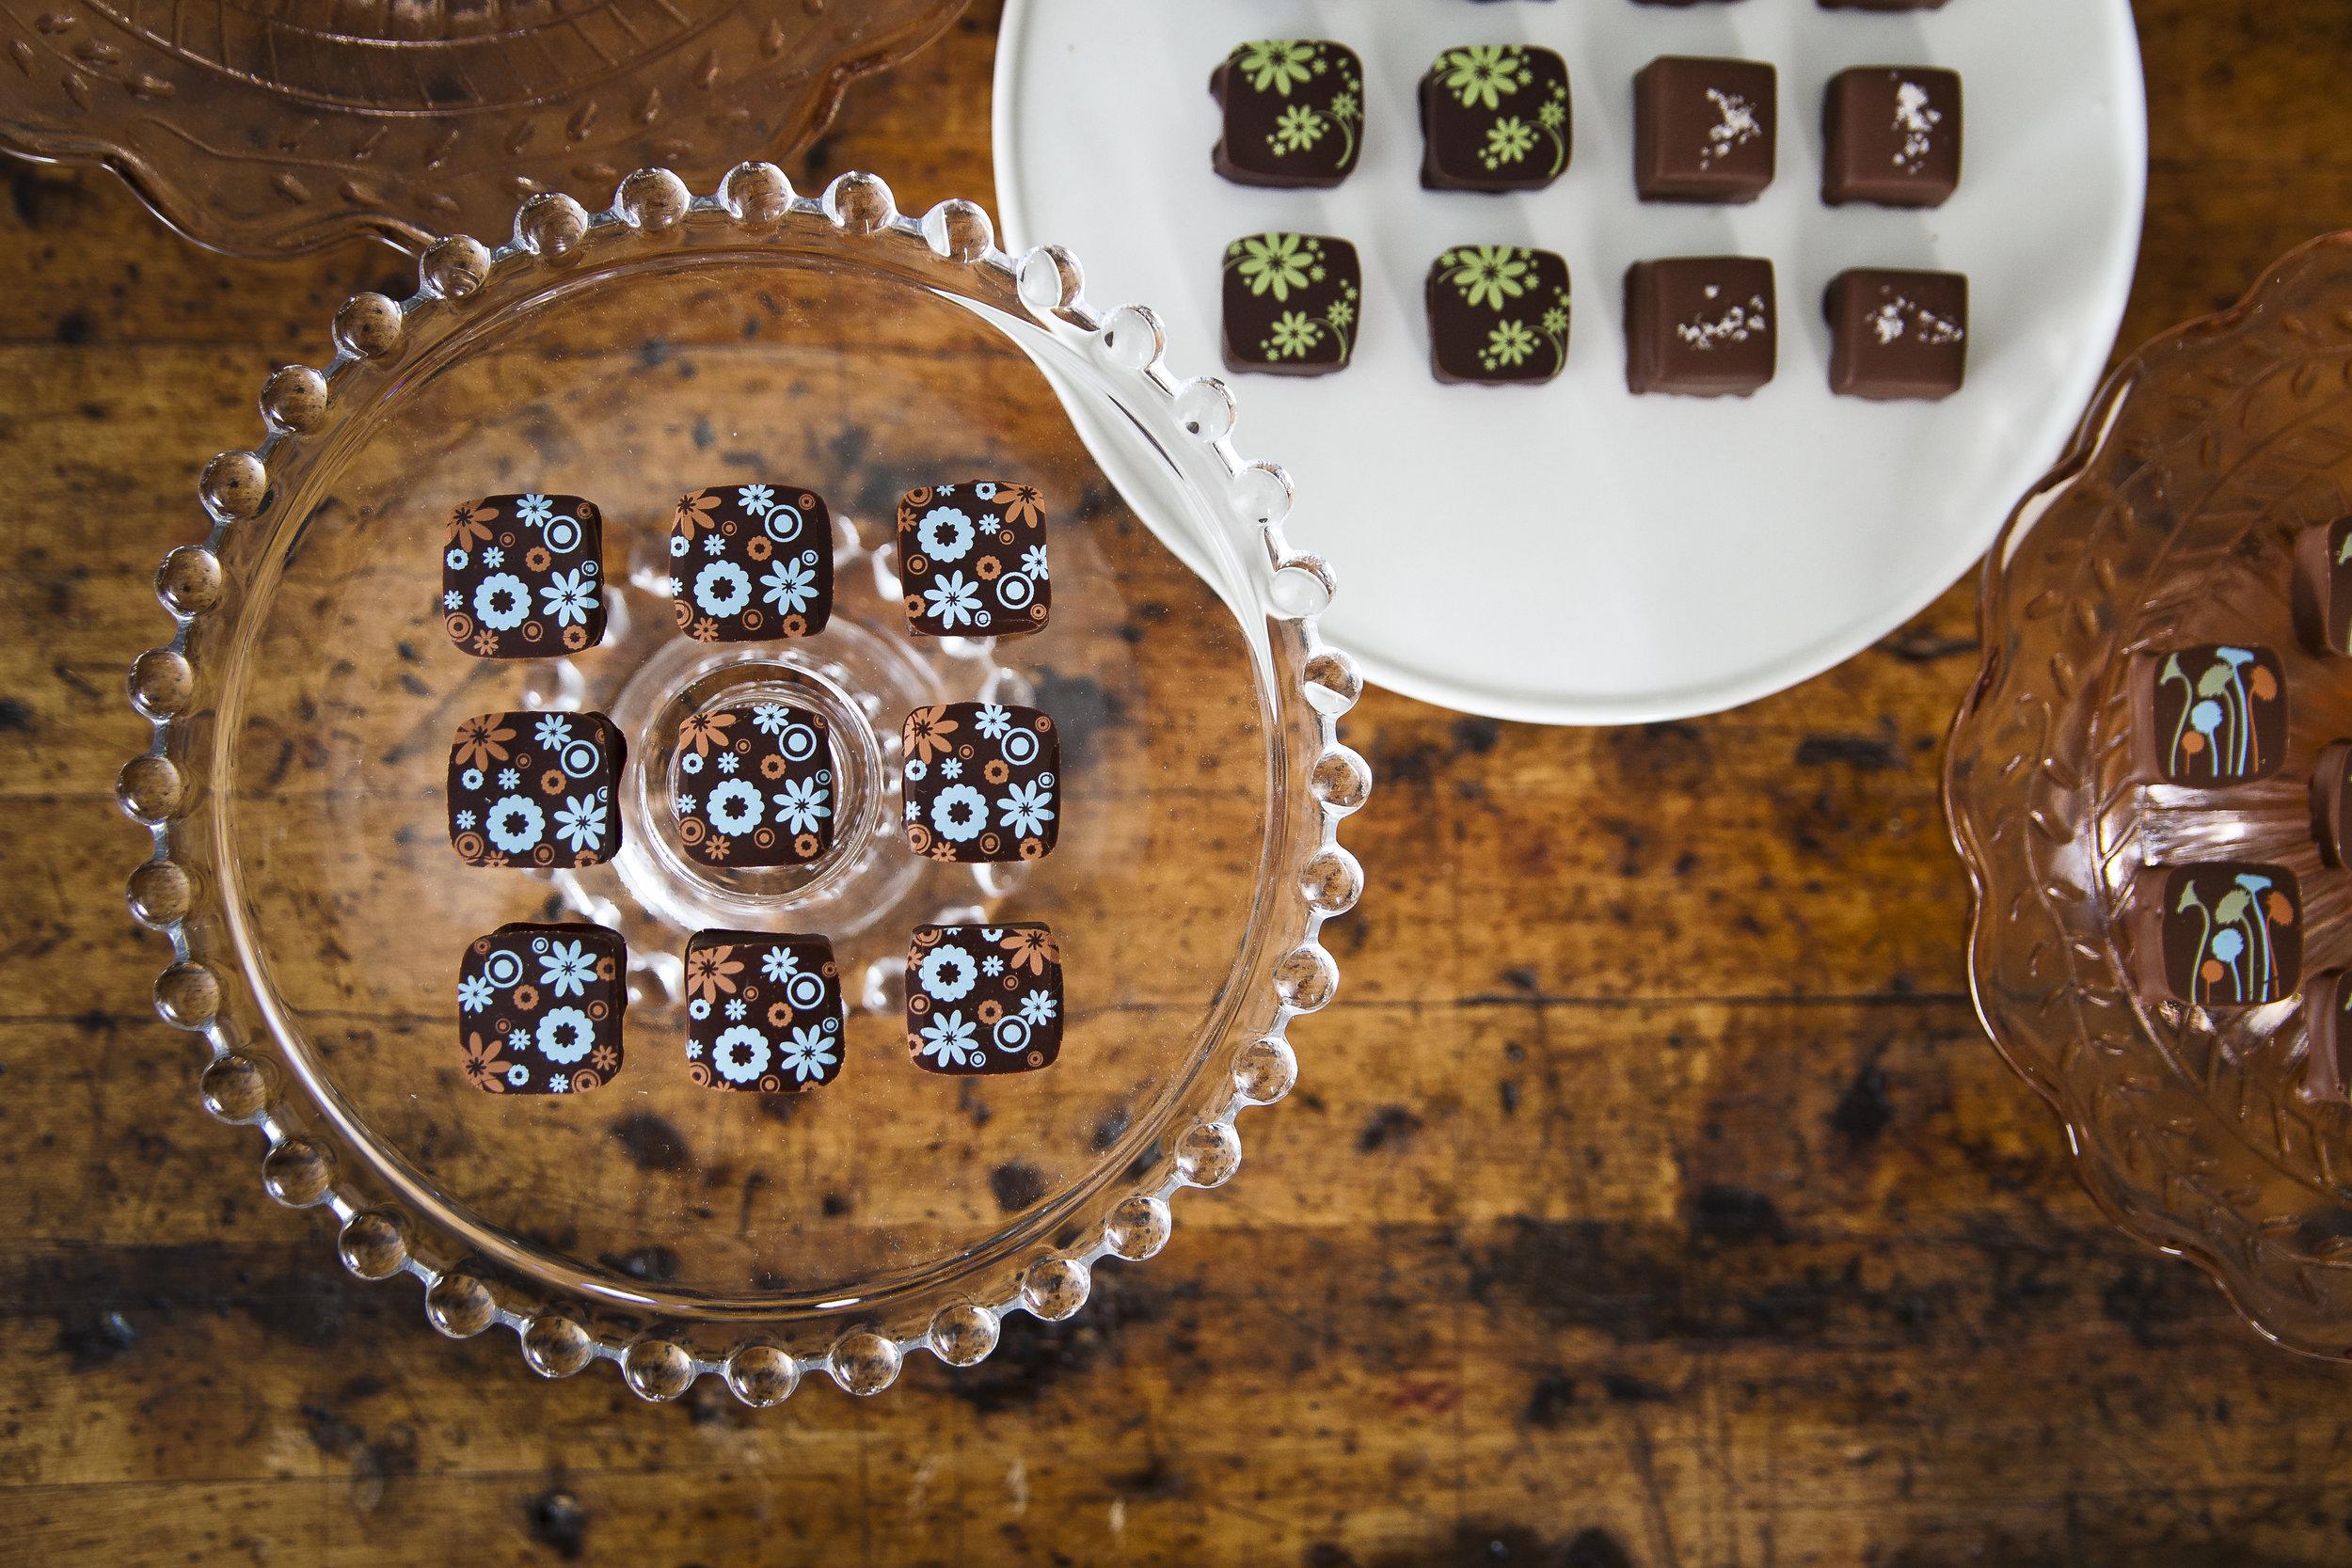 fleurir-chocolates-2011-2787.jpg